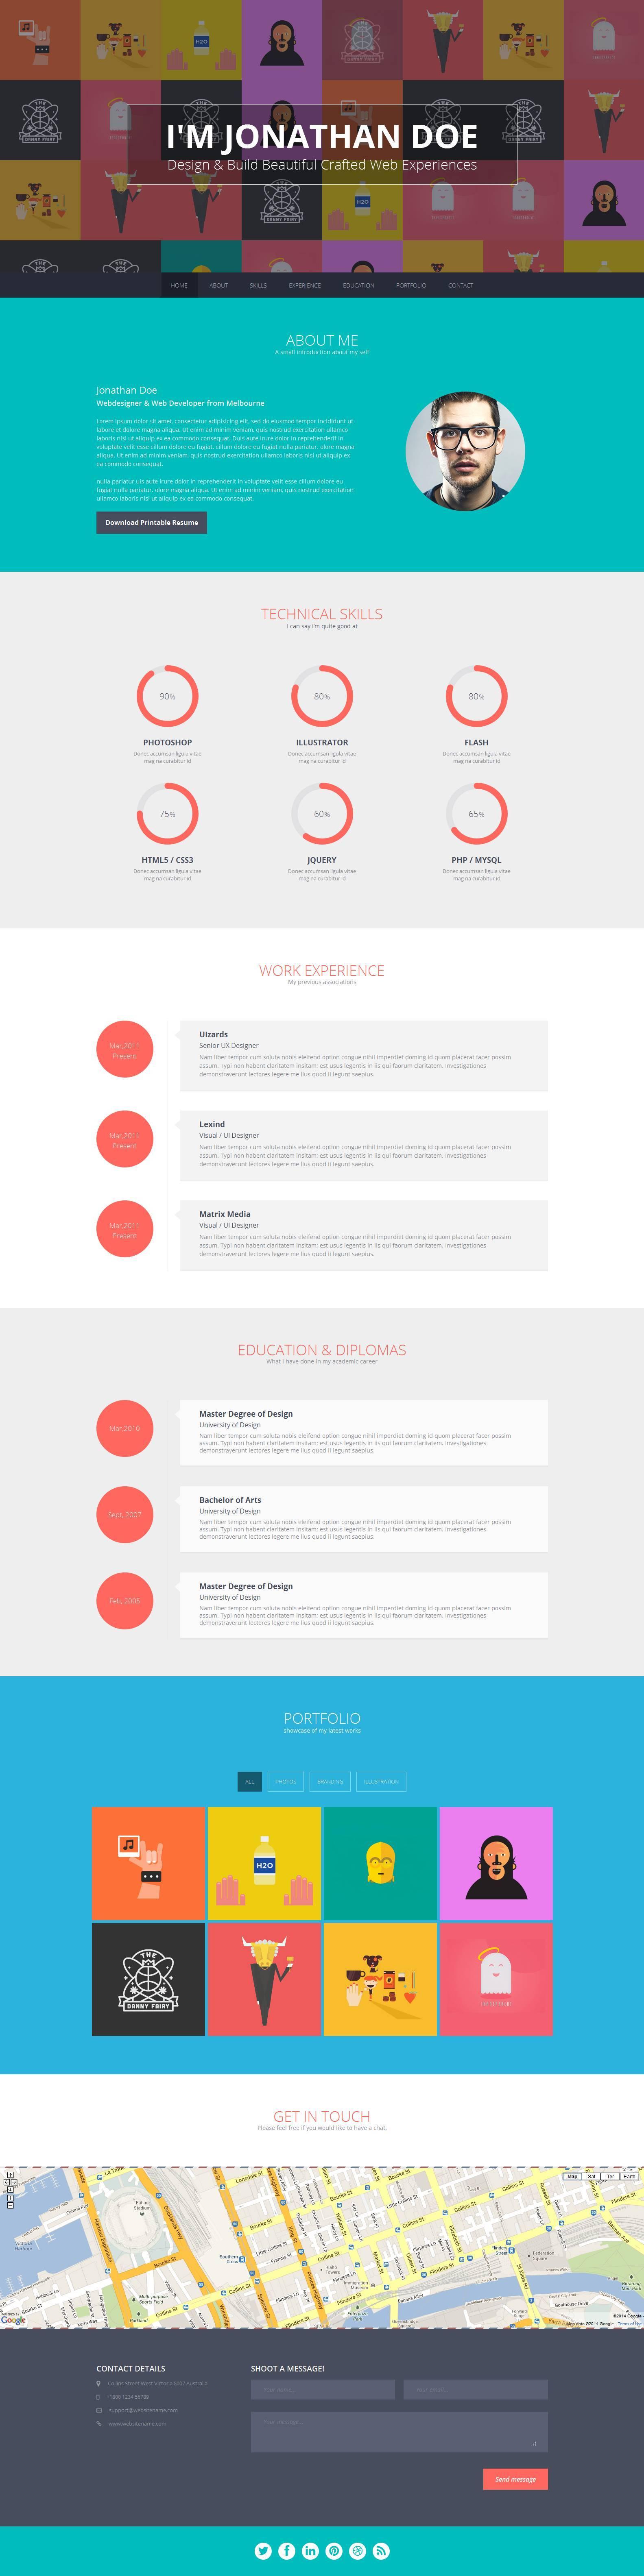 Flato - Responsive Resume, Personal Portfolio Temp by themeelite ...